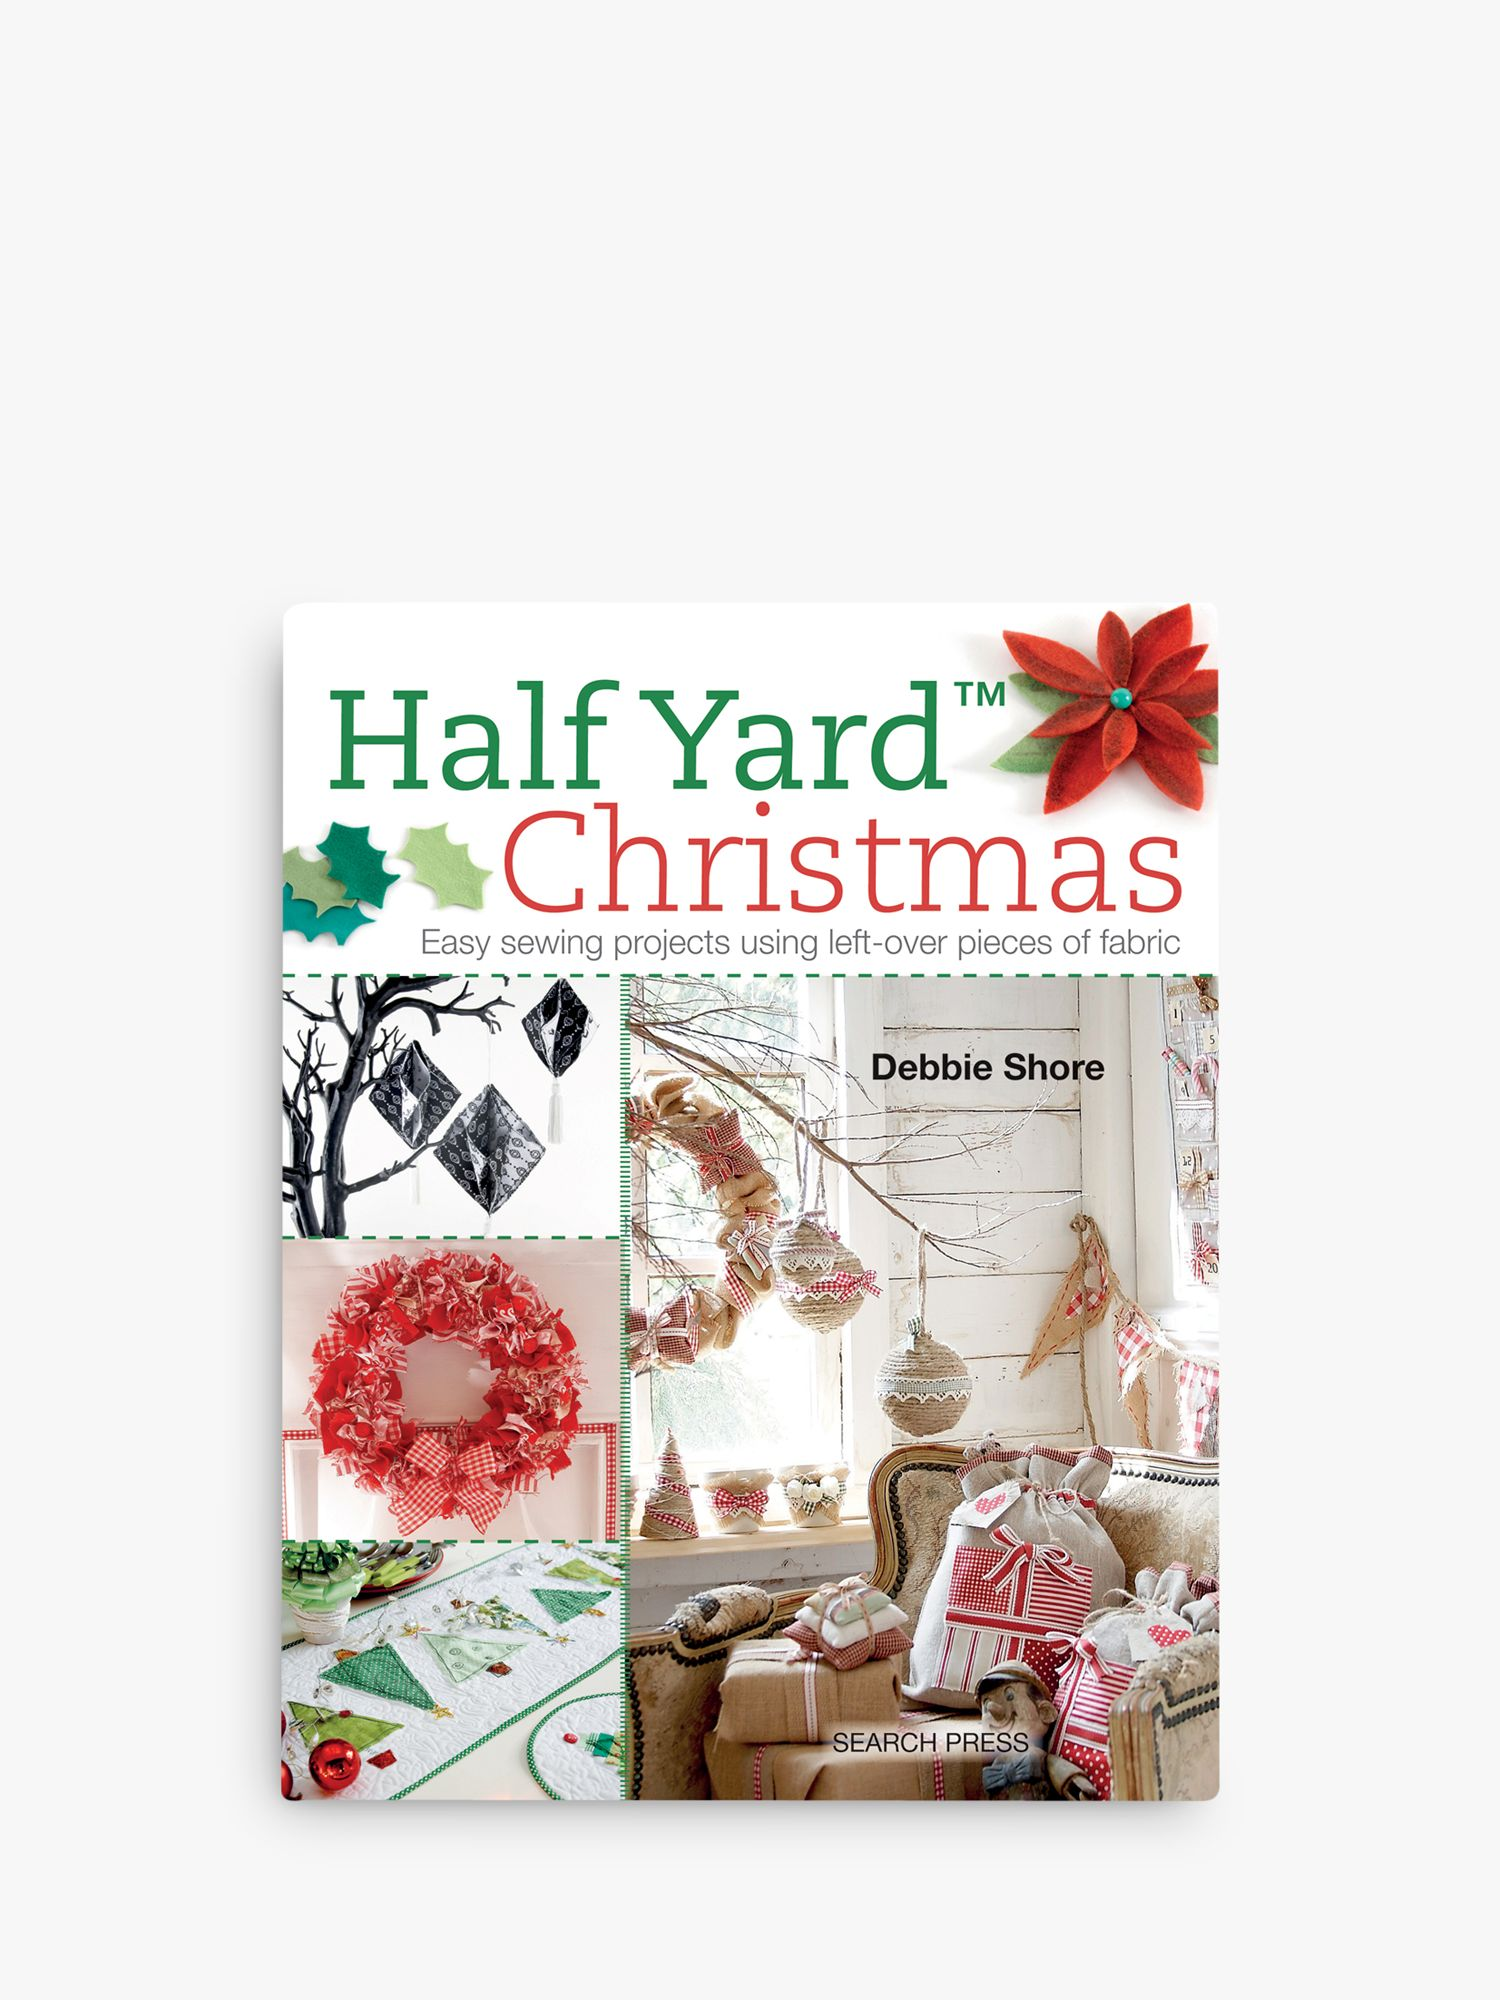 Search Press Search Press Half Yard Christmas and Sew Advent Calendars Book Bundle